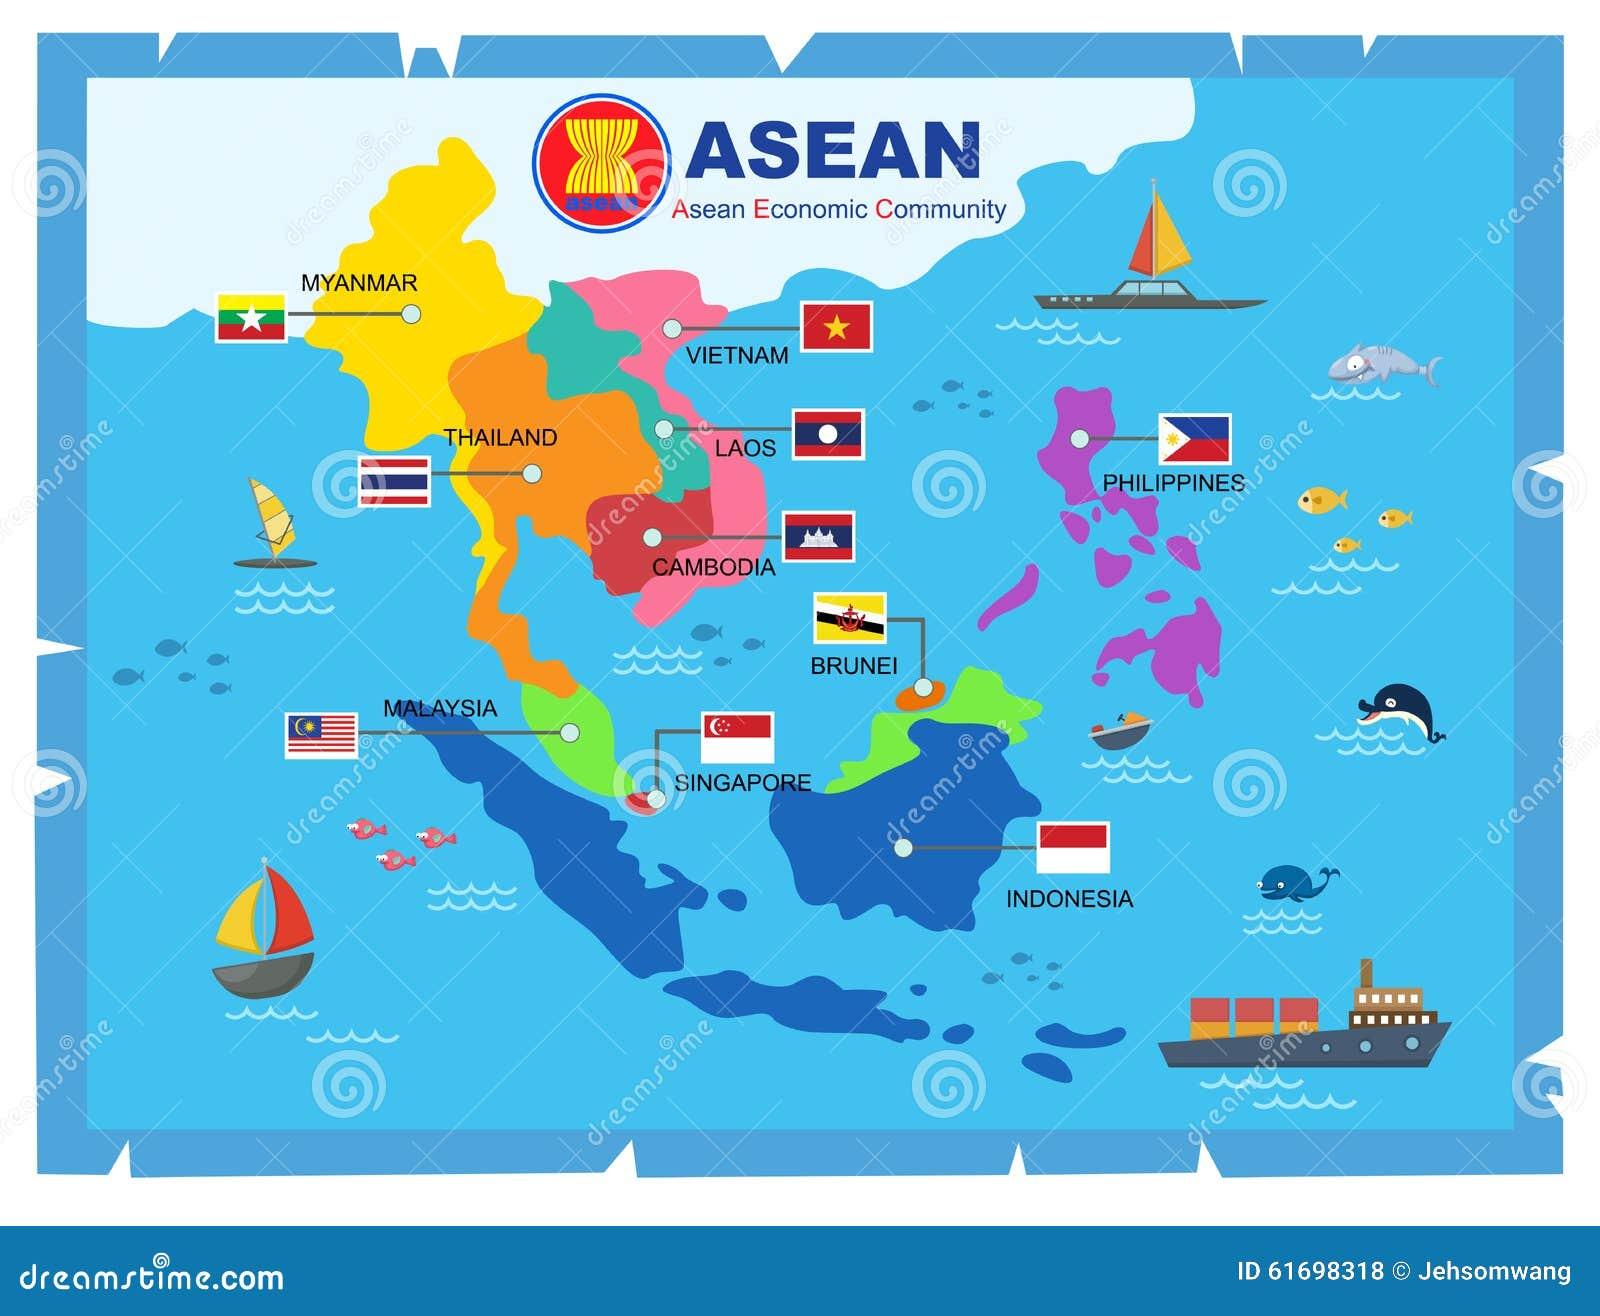 carte du monde de la communaut233 233conomique dasean de l